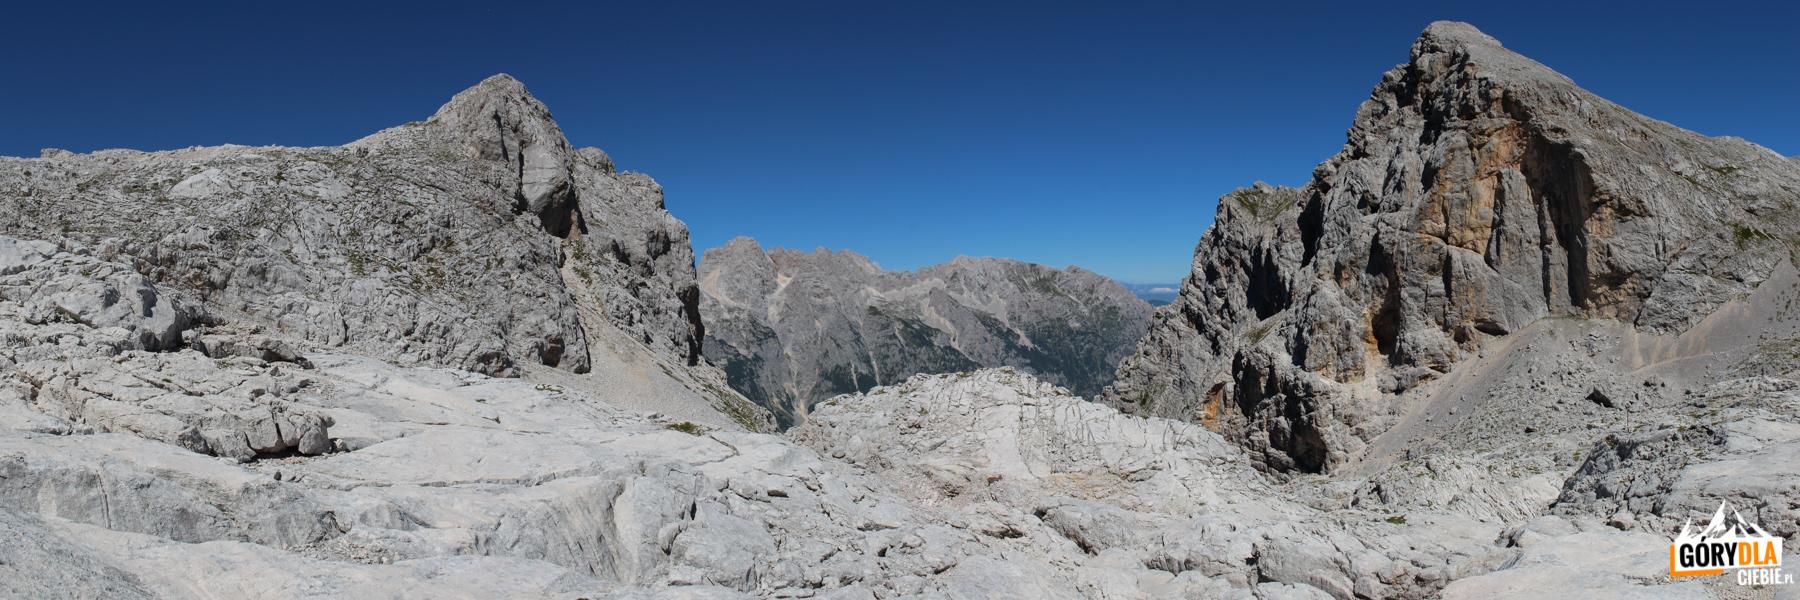 Widok ze środka kotła na Begunjski vrh (2461 m)